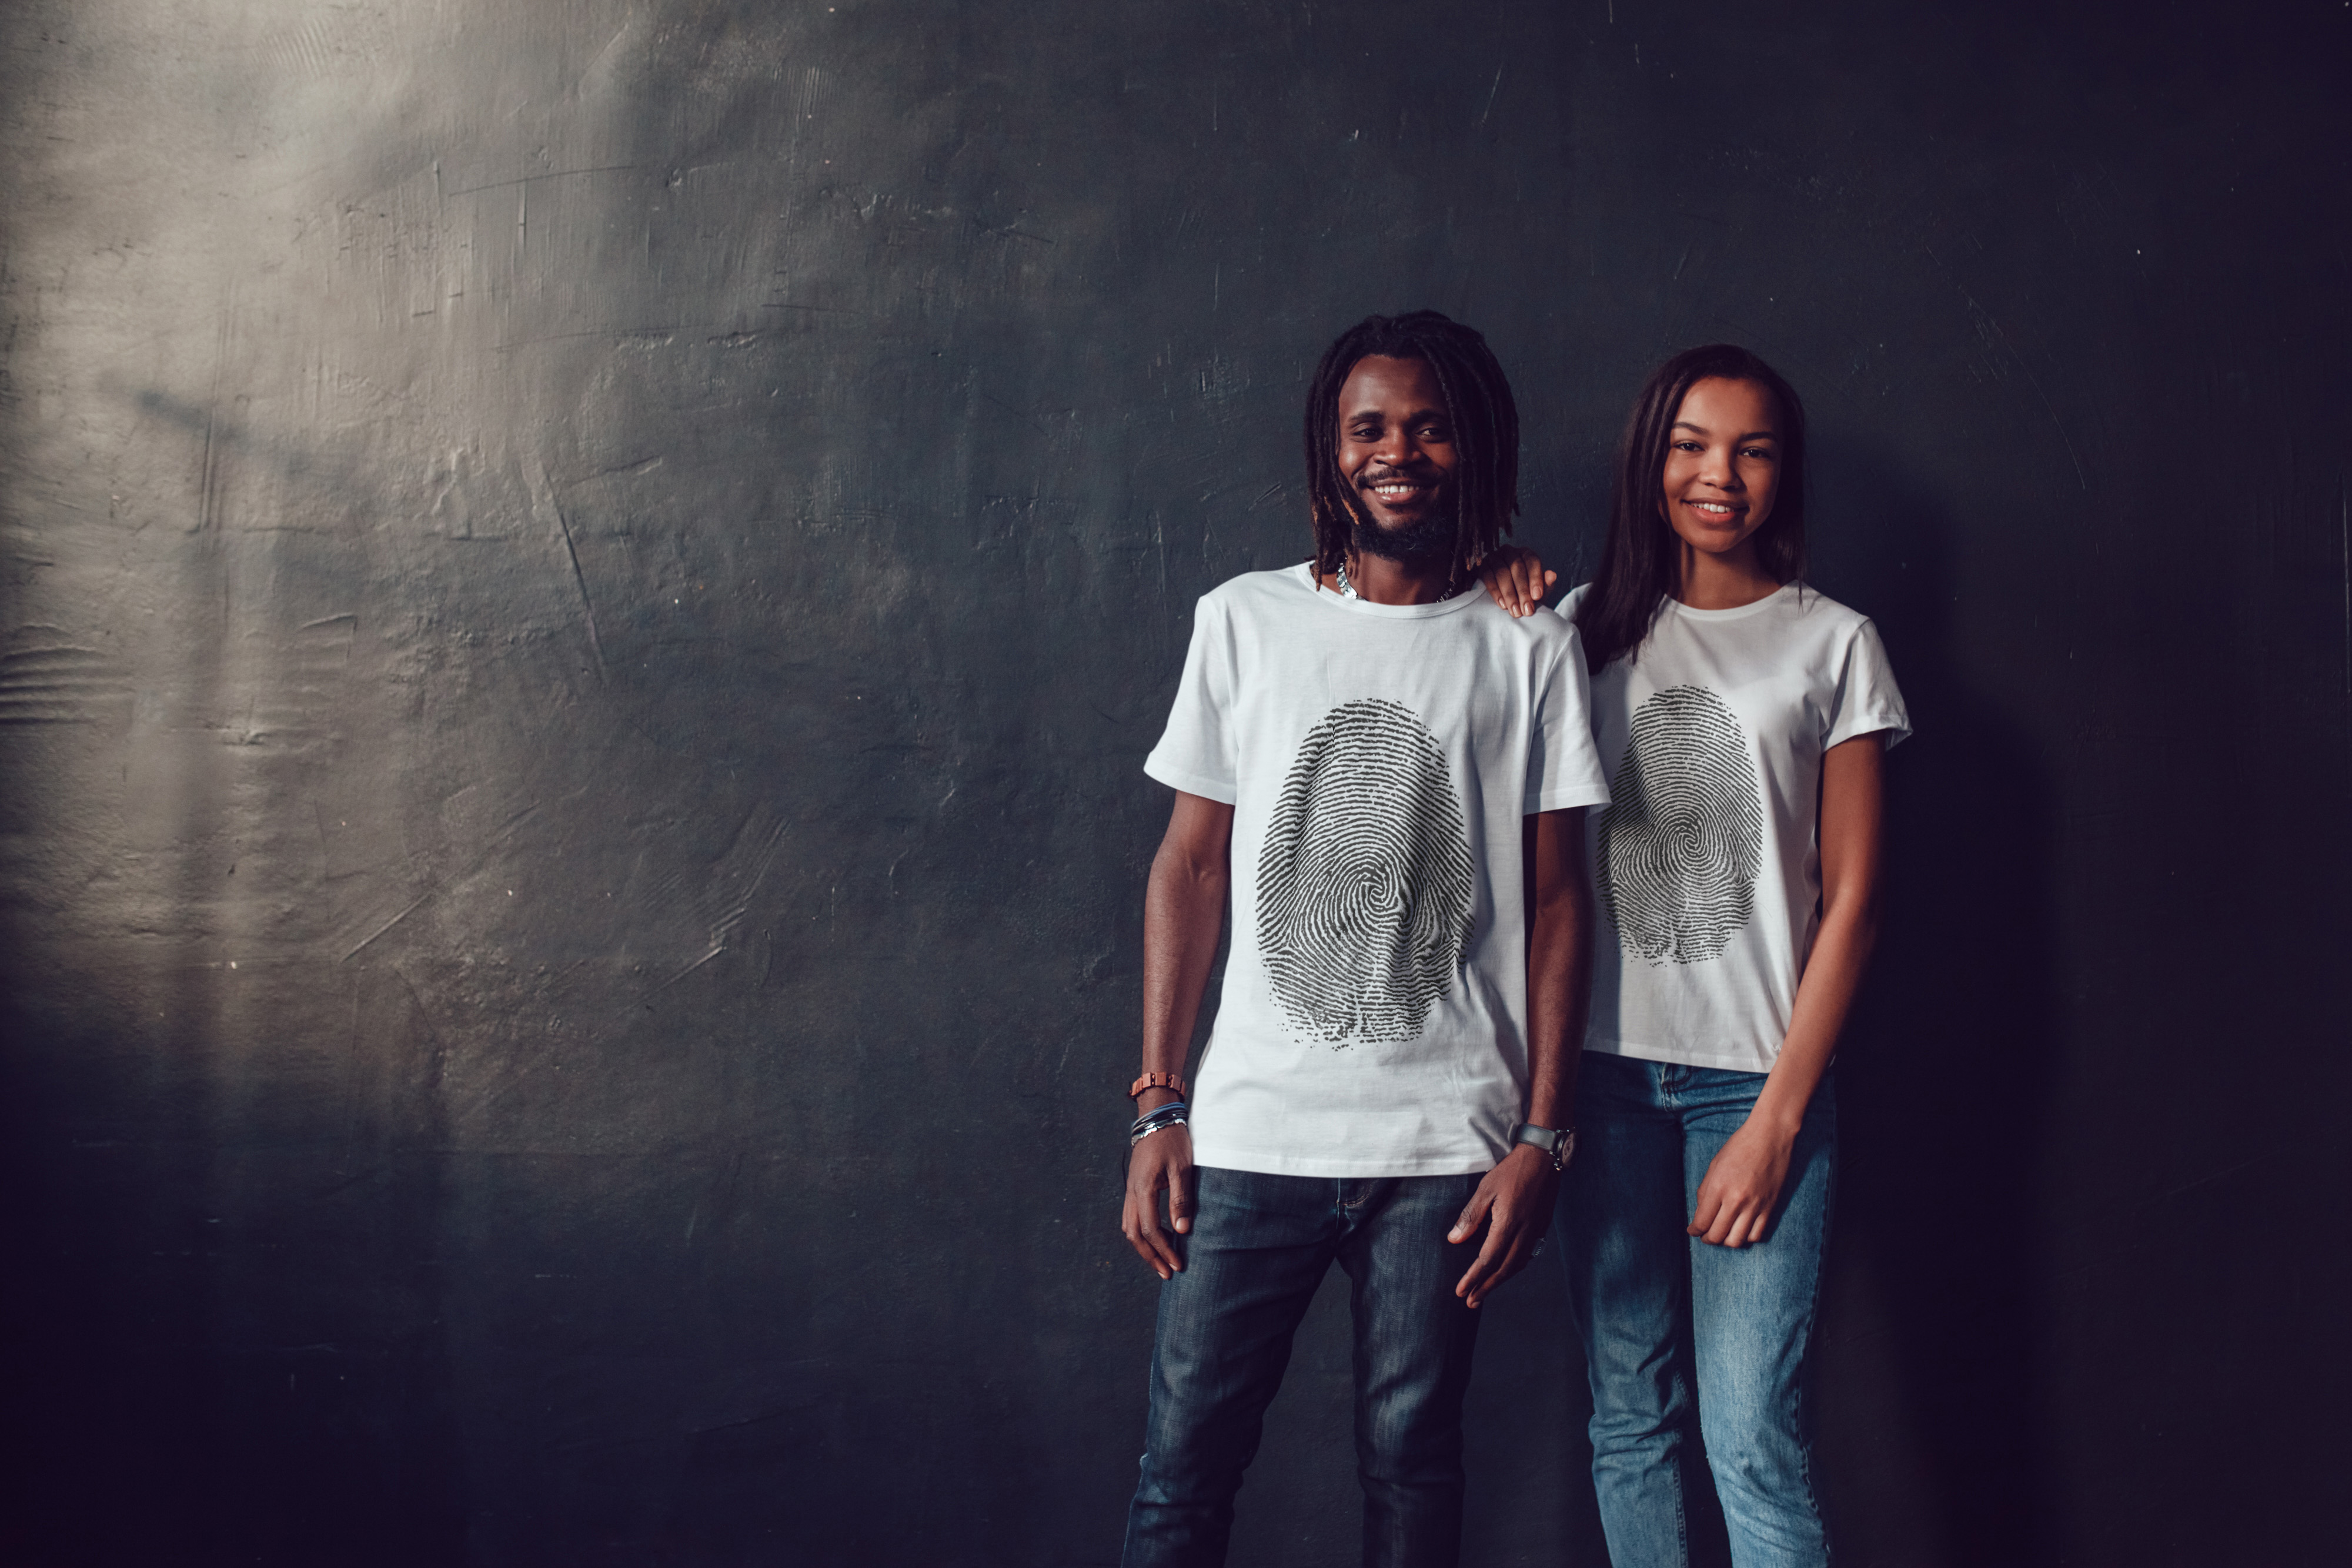 T-Shirt Mock-Up 2018 #1 example image 12